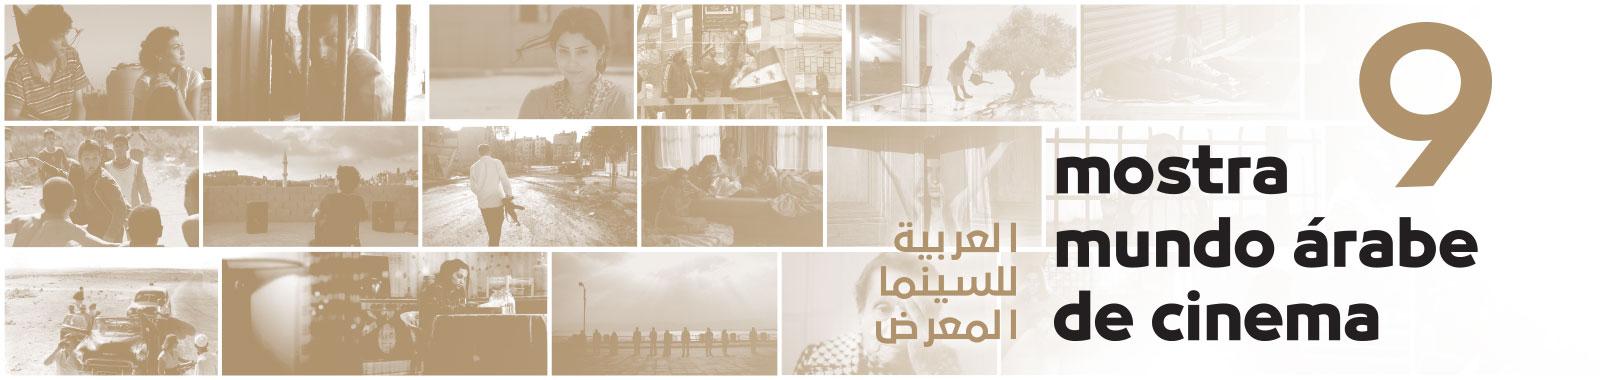 9_mostra_arabe_001